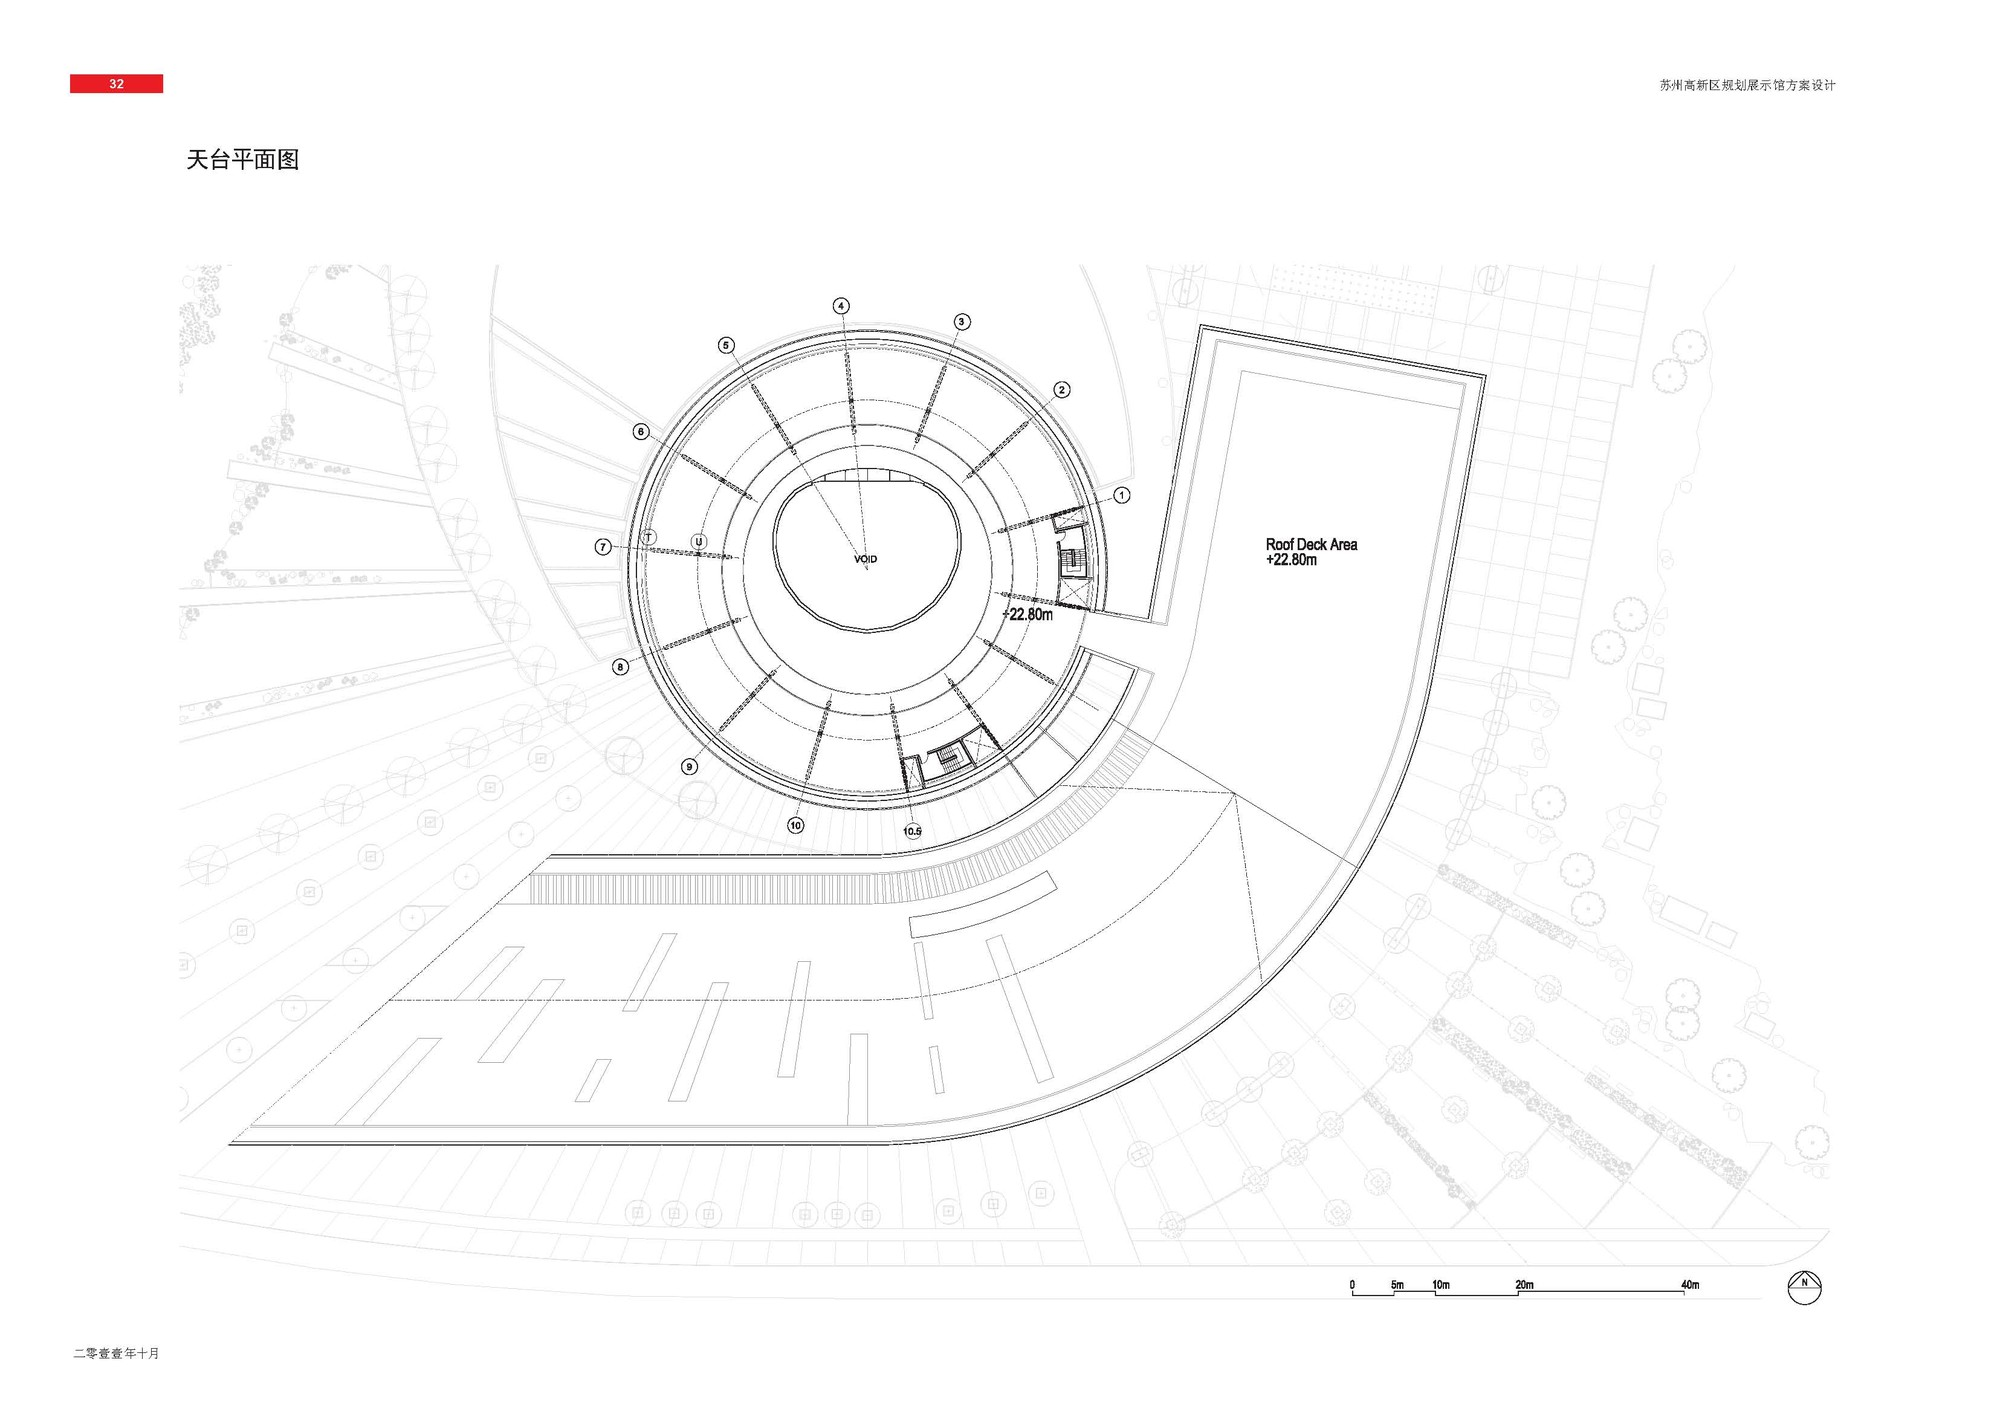 gallery of suzhou snd district urban planning exhibition hall suzhou snd district urban planning exhibition hall floor plan